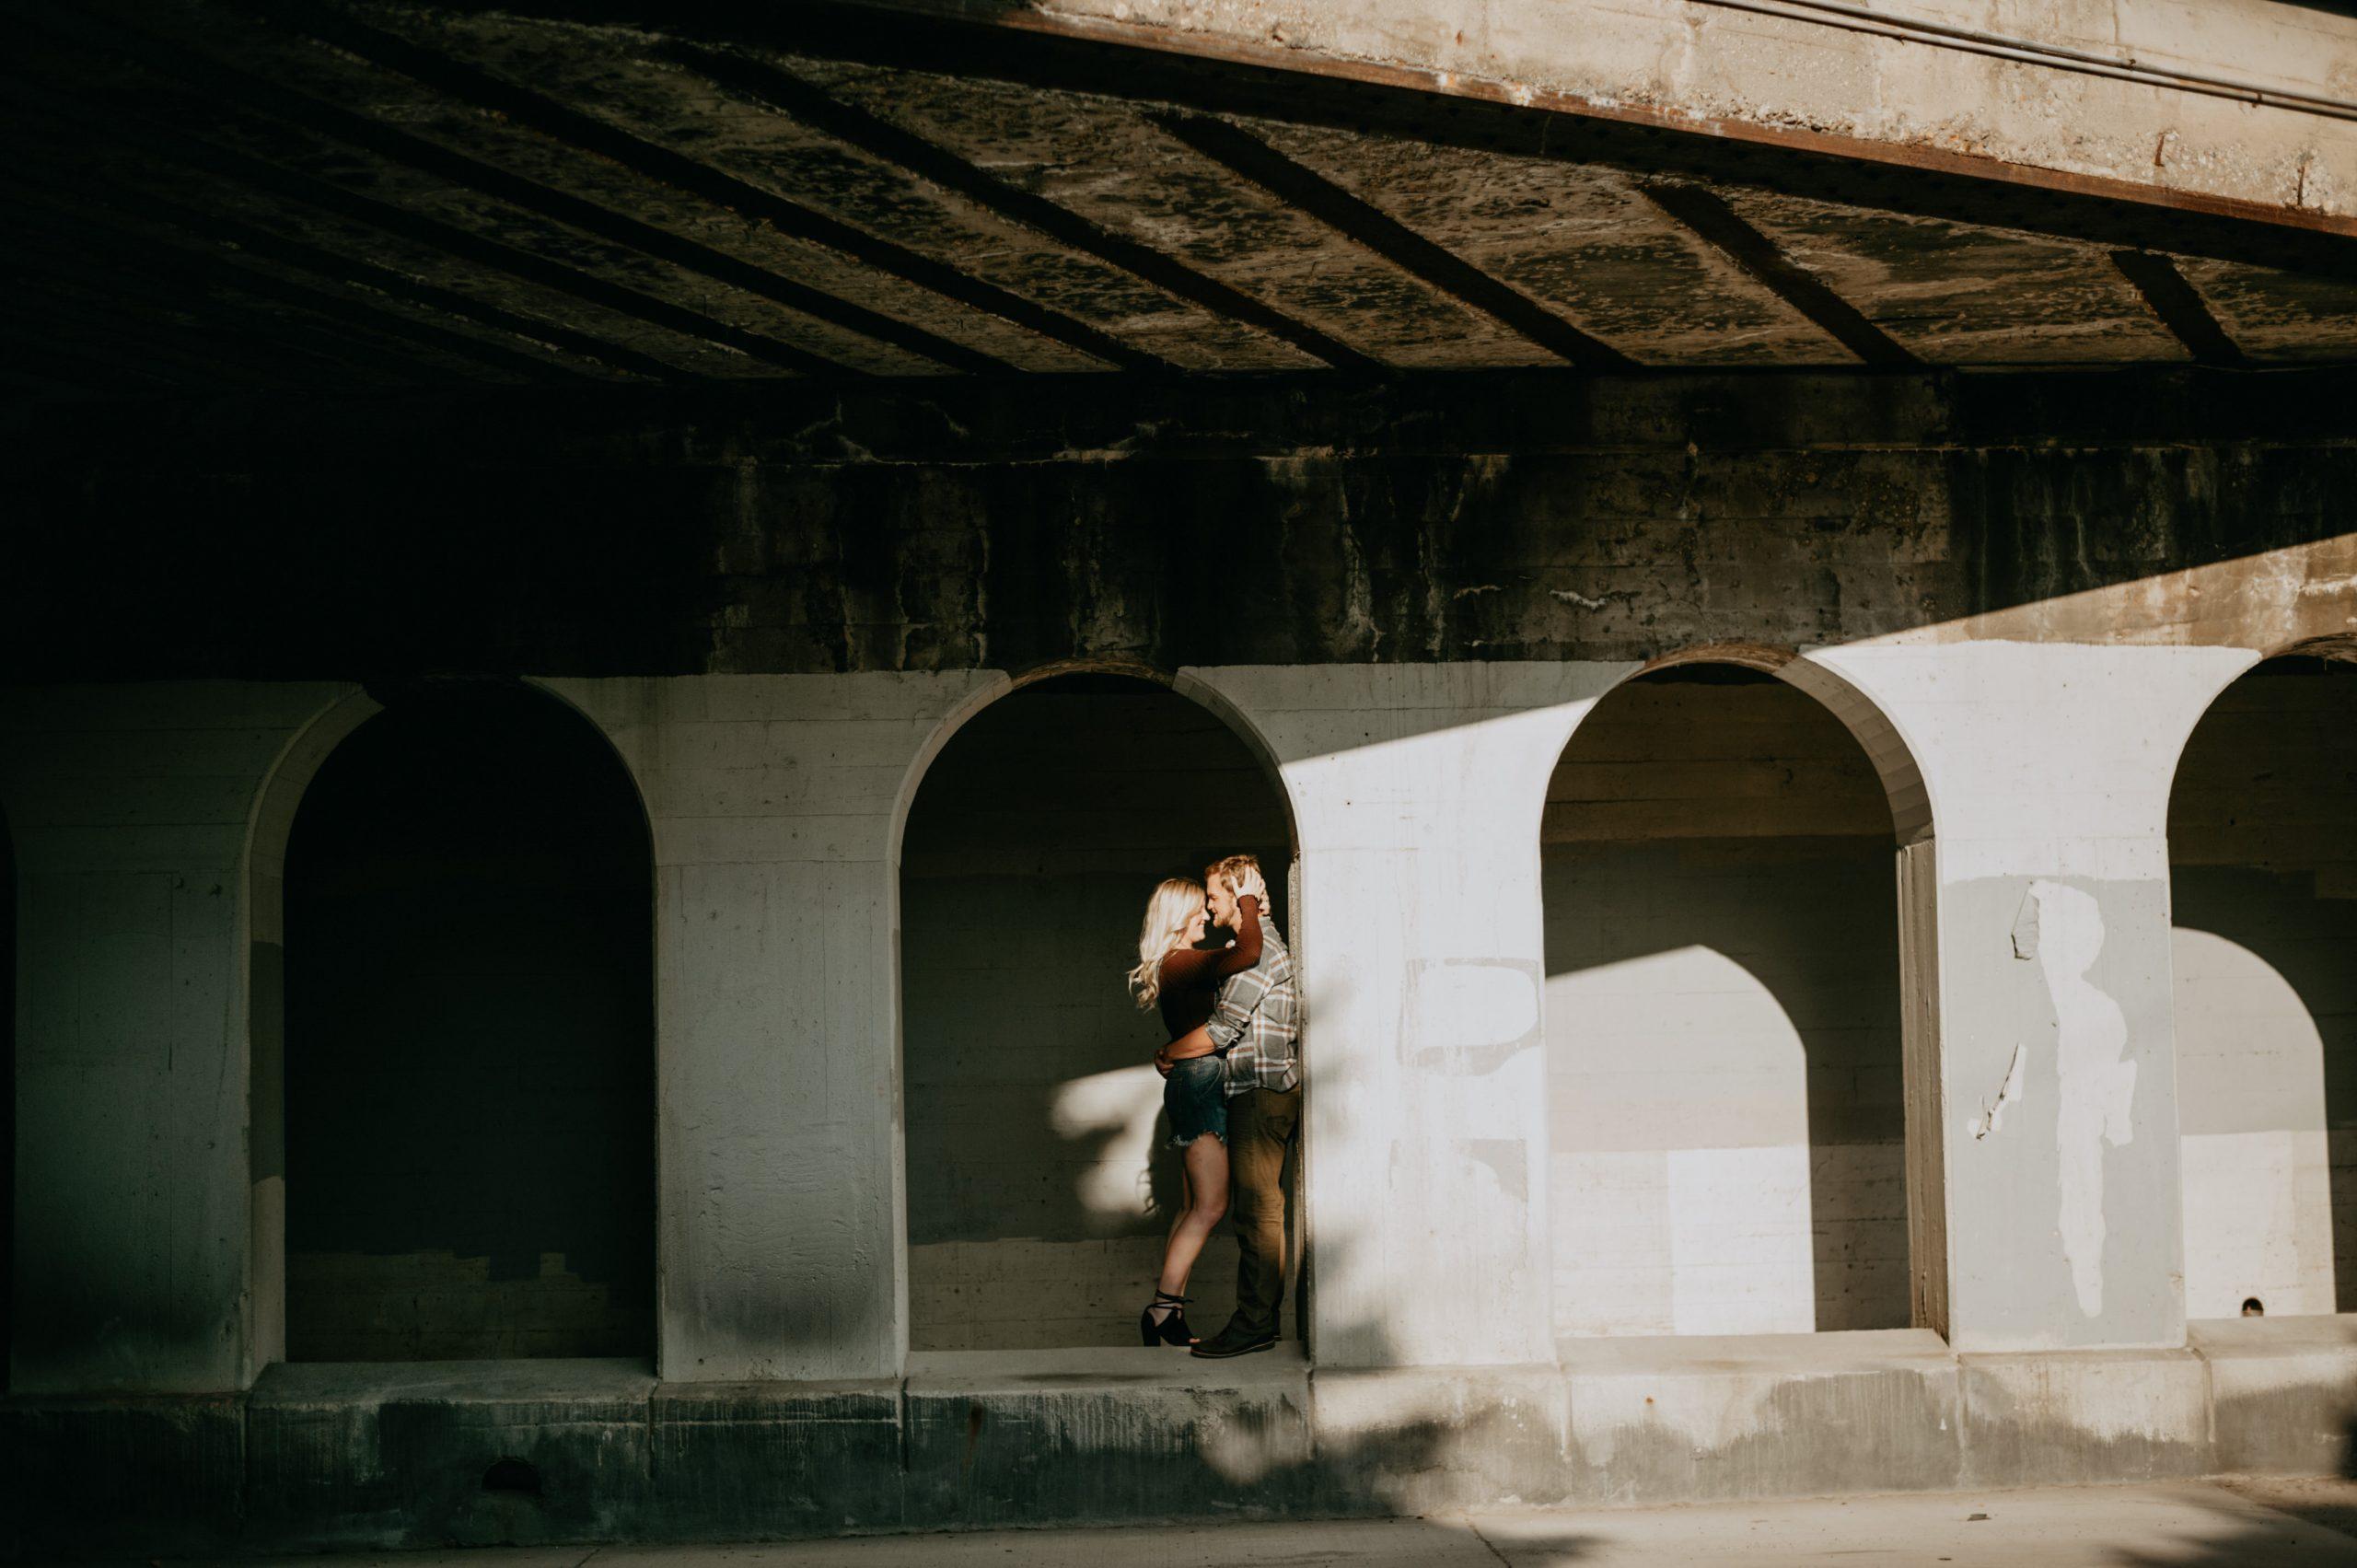 downtown minneapolis direct sunlight bridge underpass engagement photos minneapolis